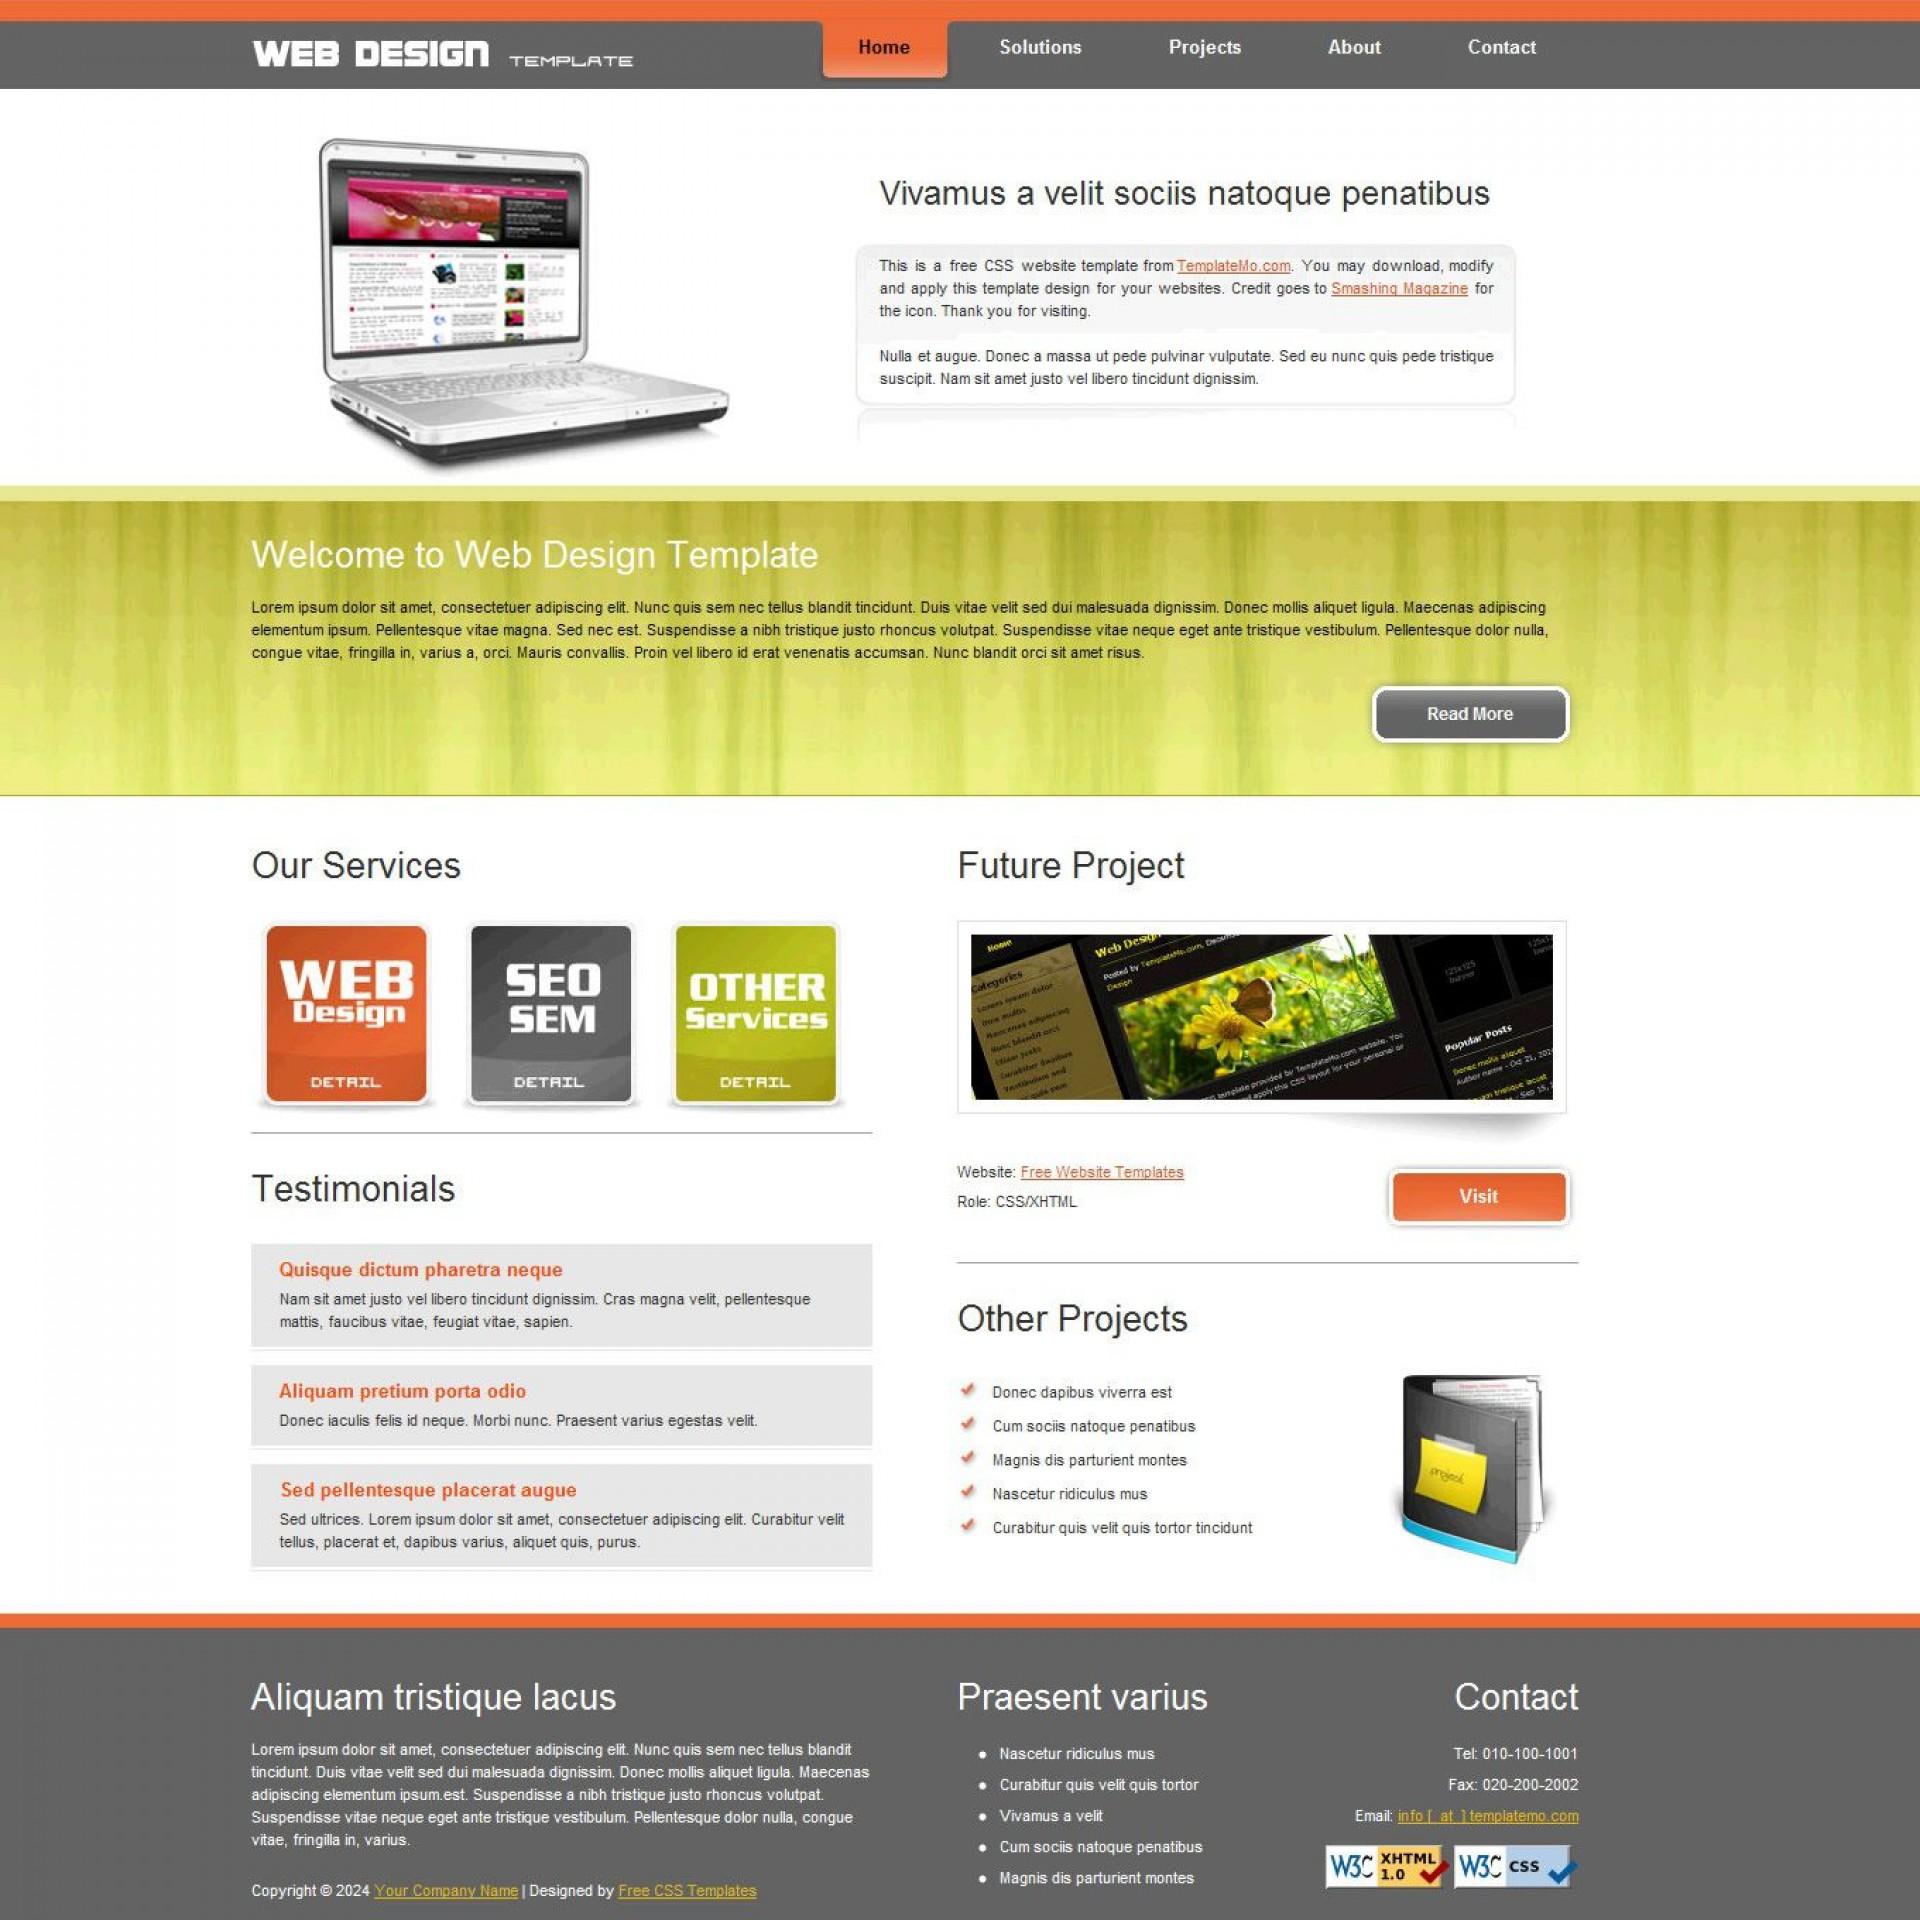 006 Marvelou Website Design Template Free Picture  Asp.net Web Download Psd1920